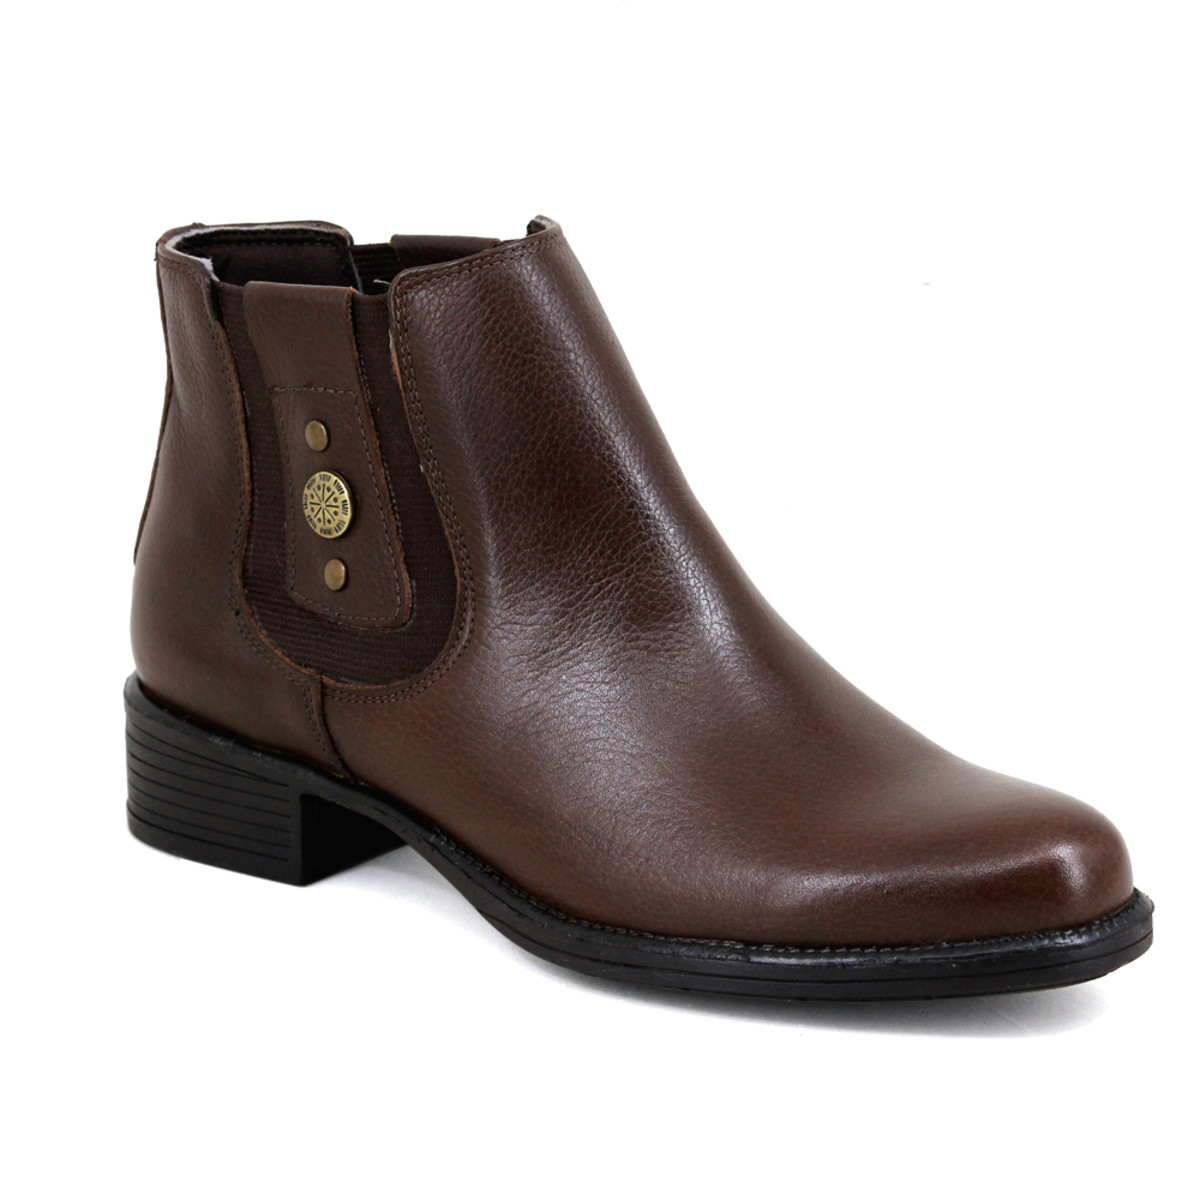 1045f05eb0 Botina Chelsea Boots Feminina Couro Legitimo Escrete 2464 no Elo7 ...